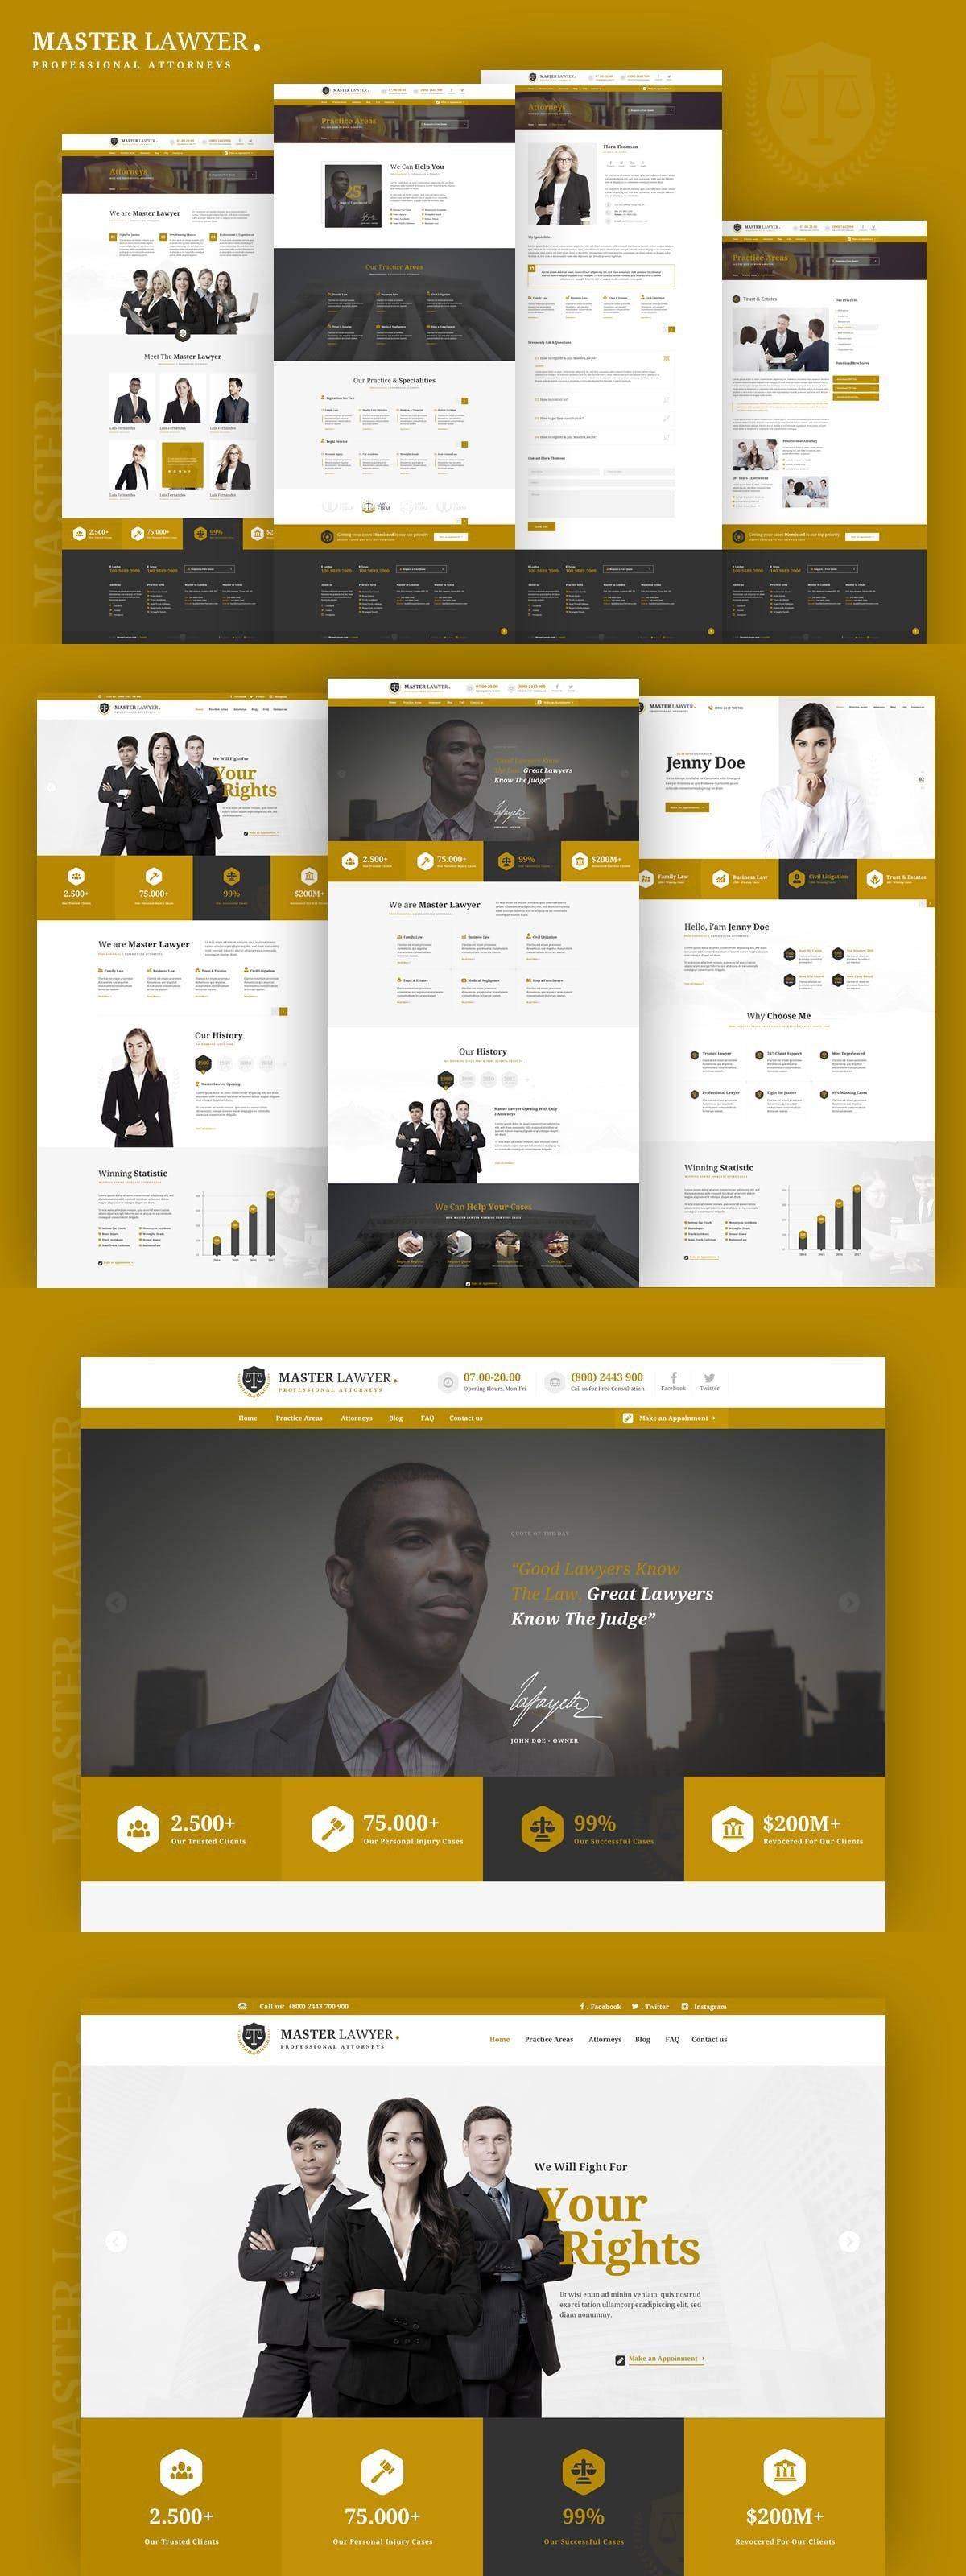 Lawyer Websites Templates